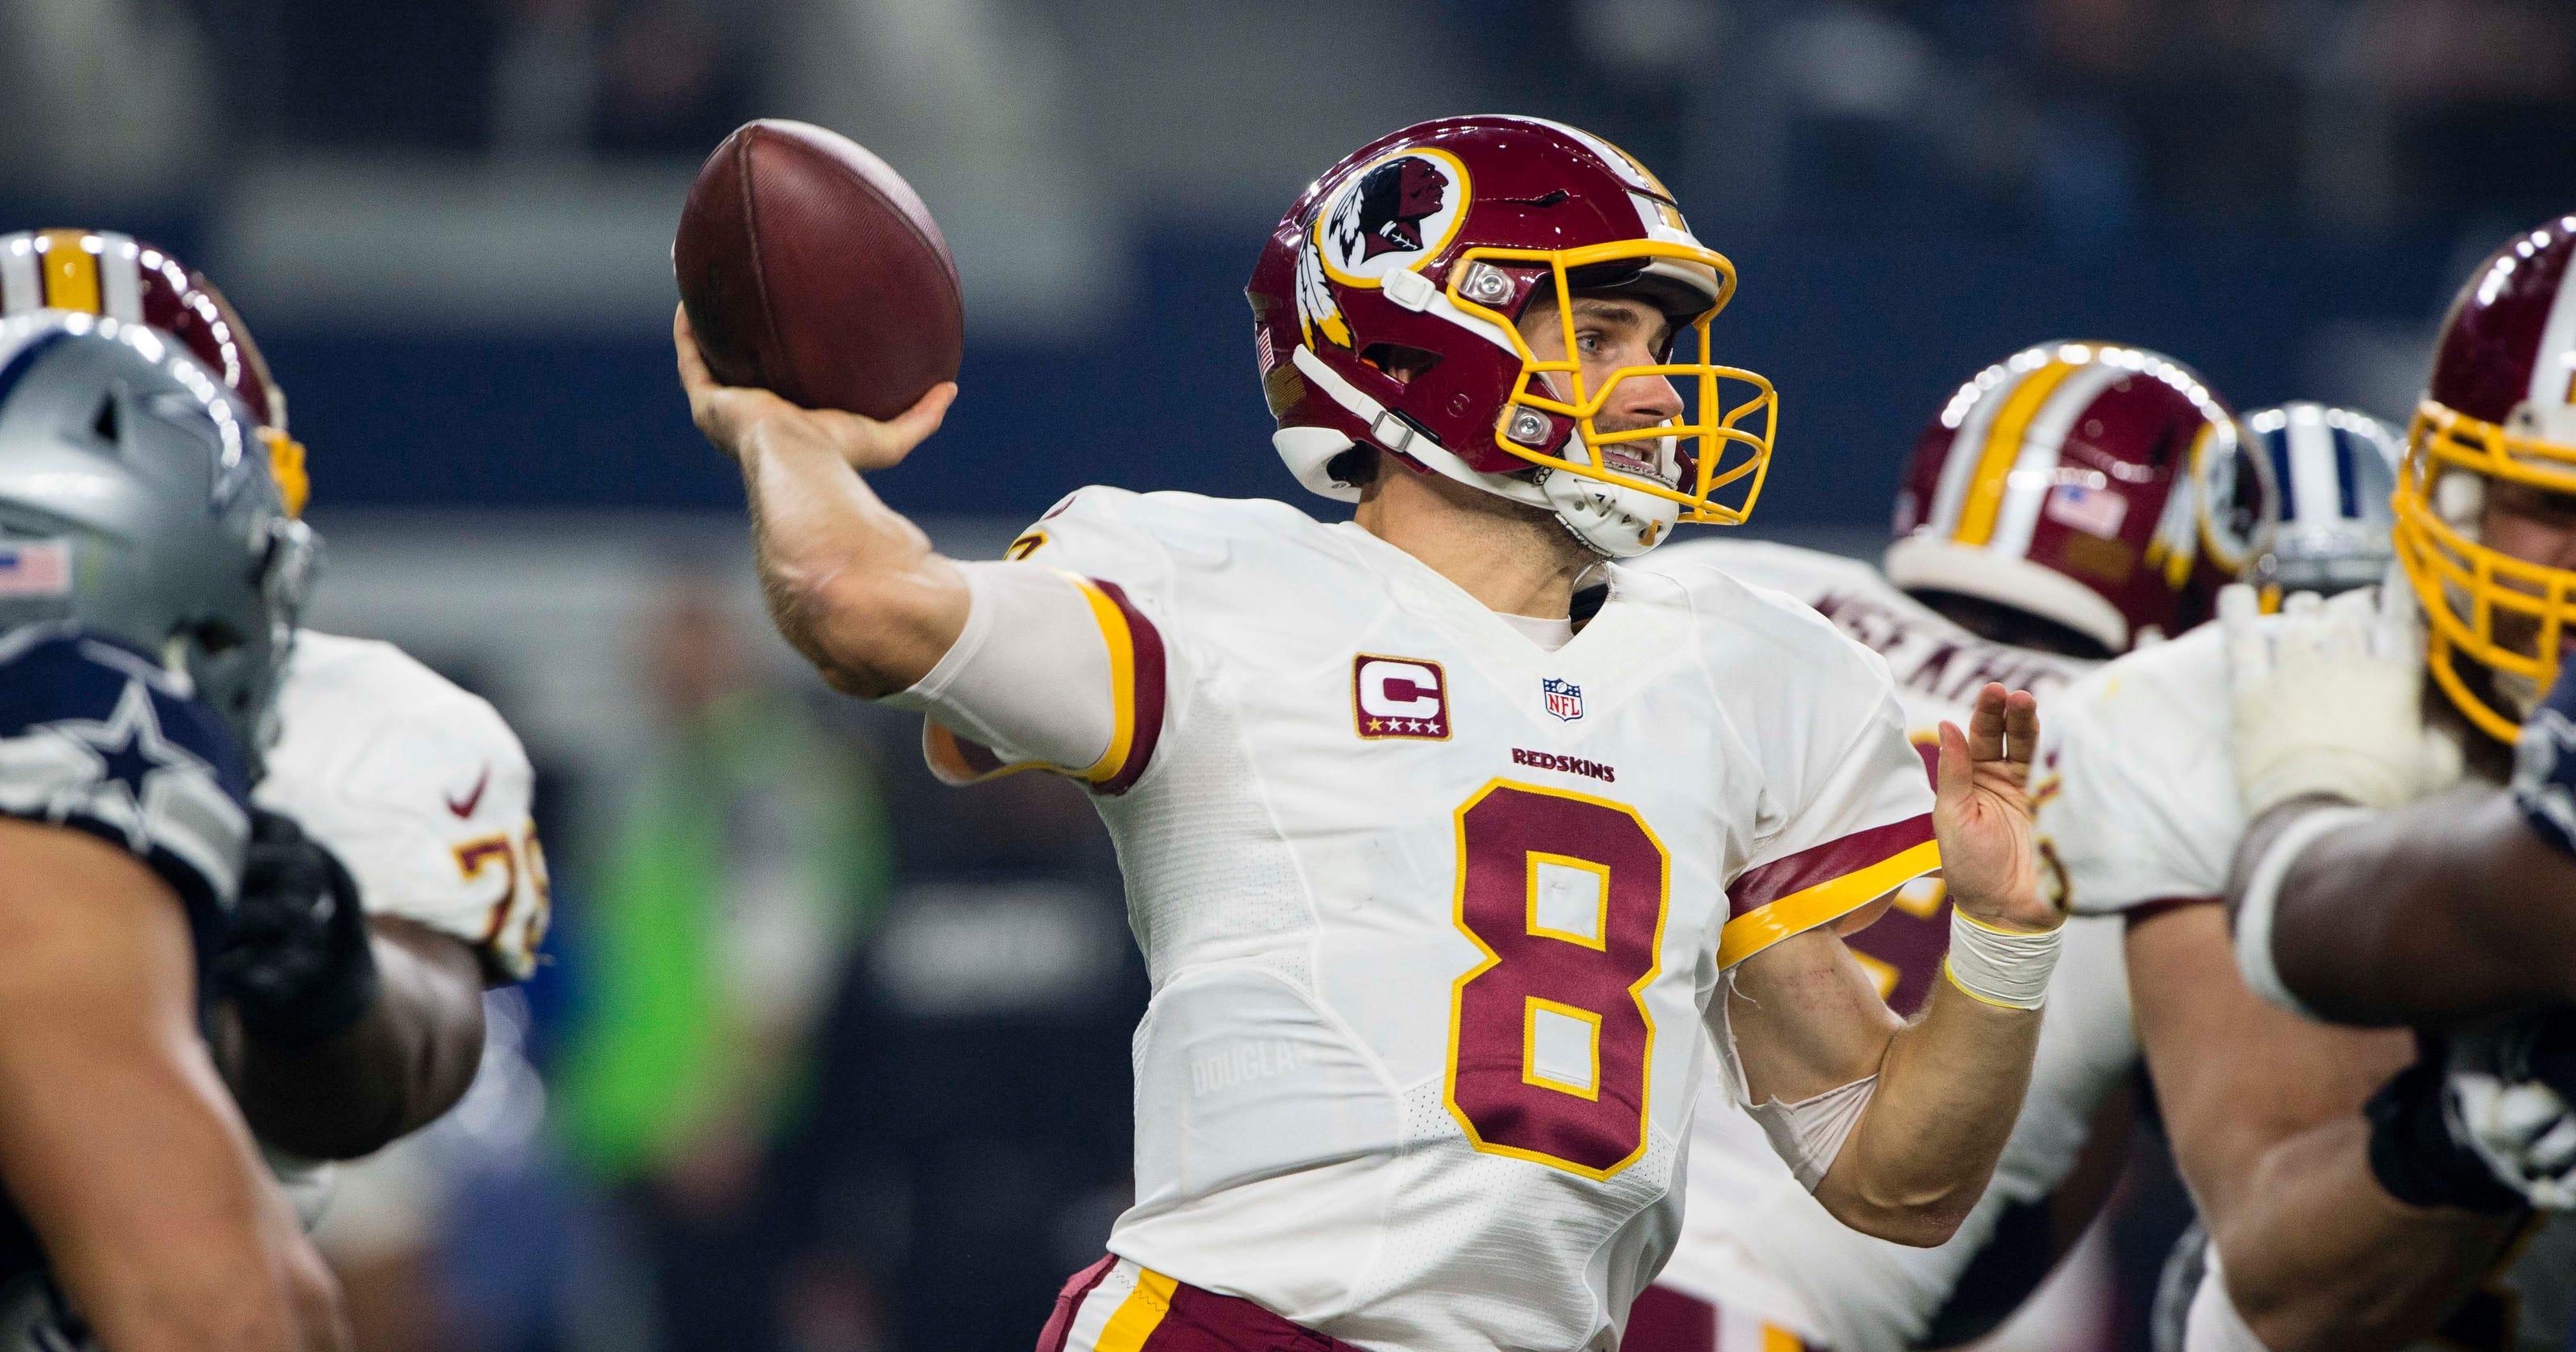 bd34ad92571 Washington Redskins' Kirk Cousins becomes a franchise QB